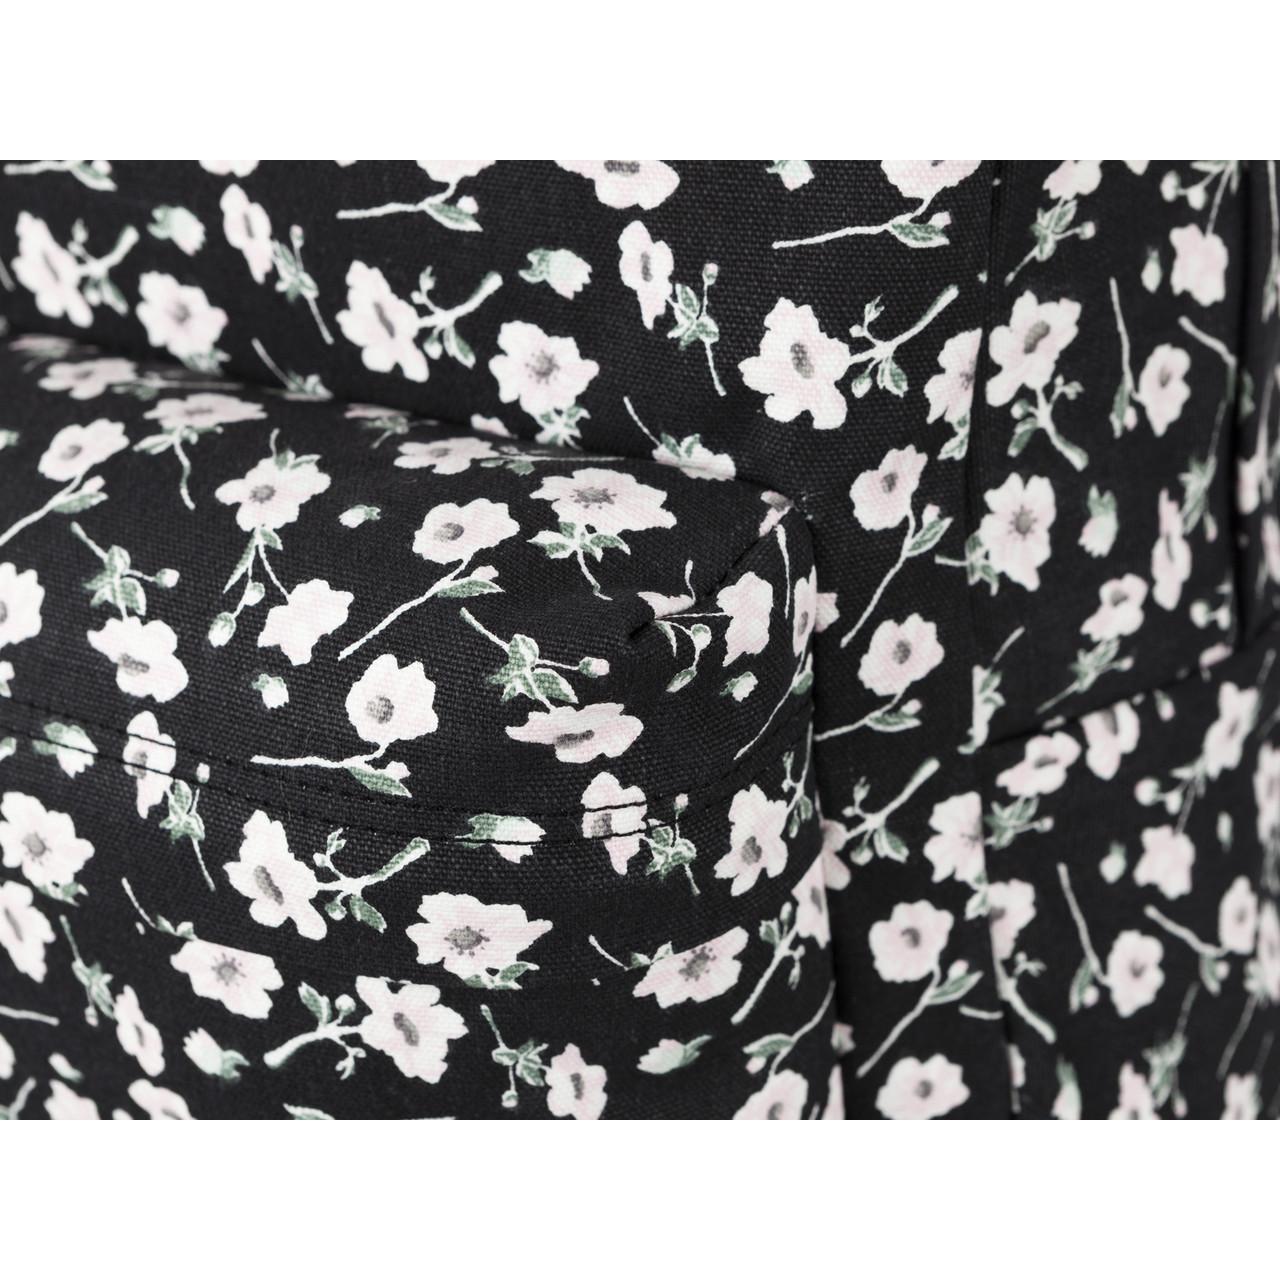 plecak vans czarny w białe kwiaty